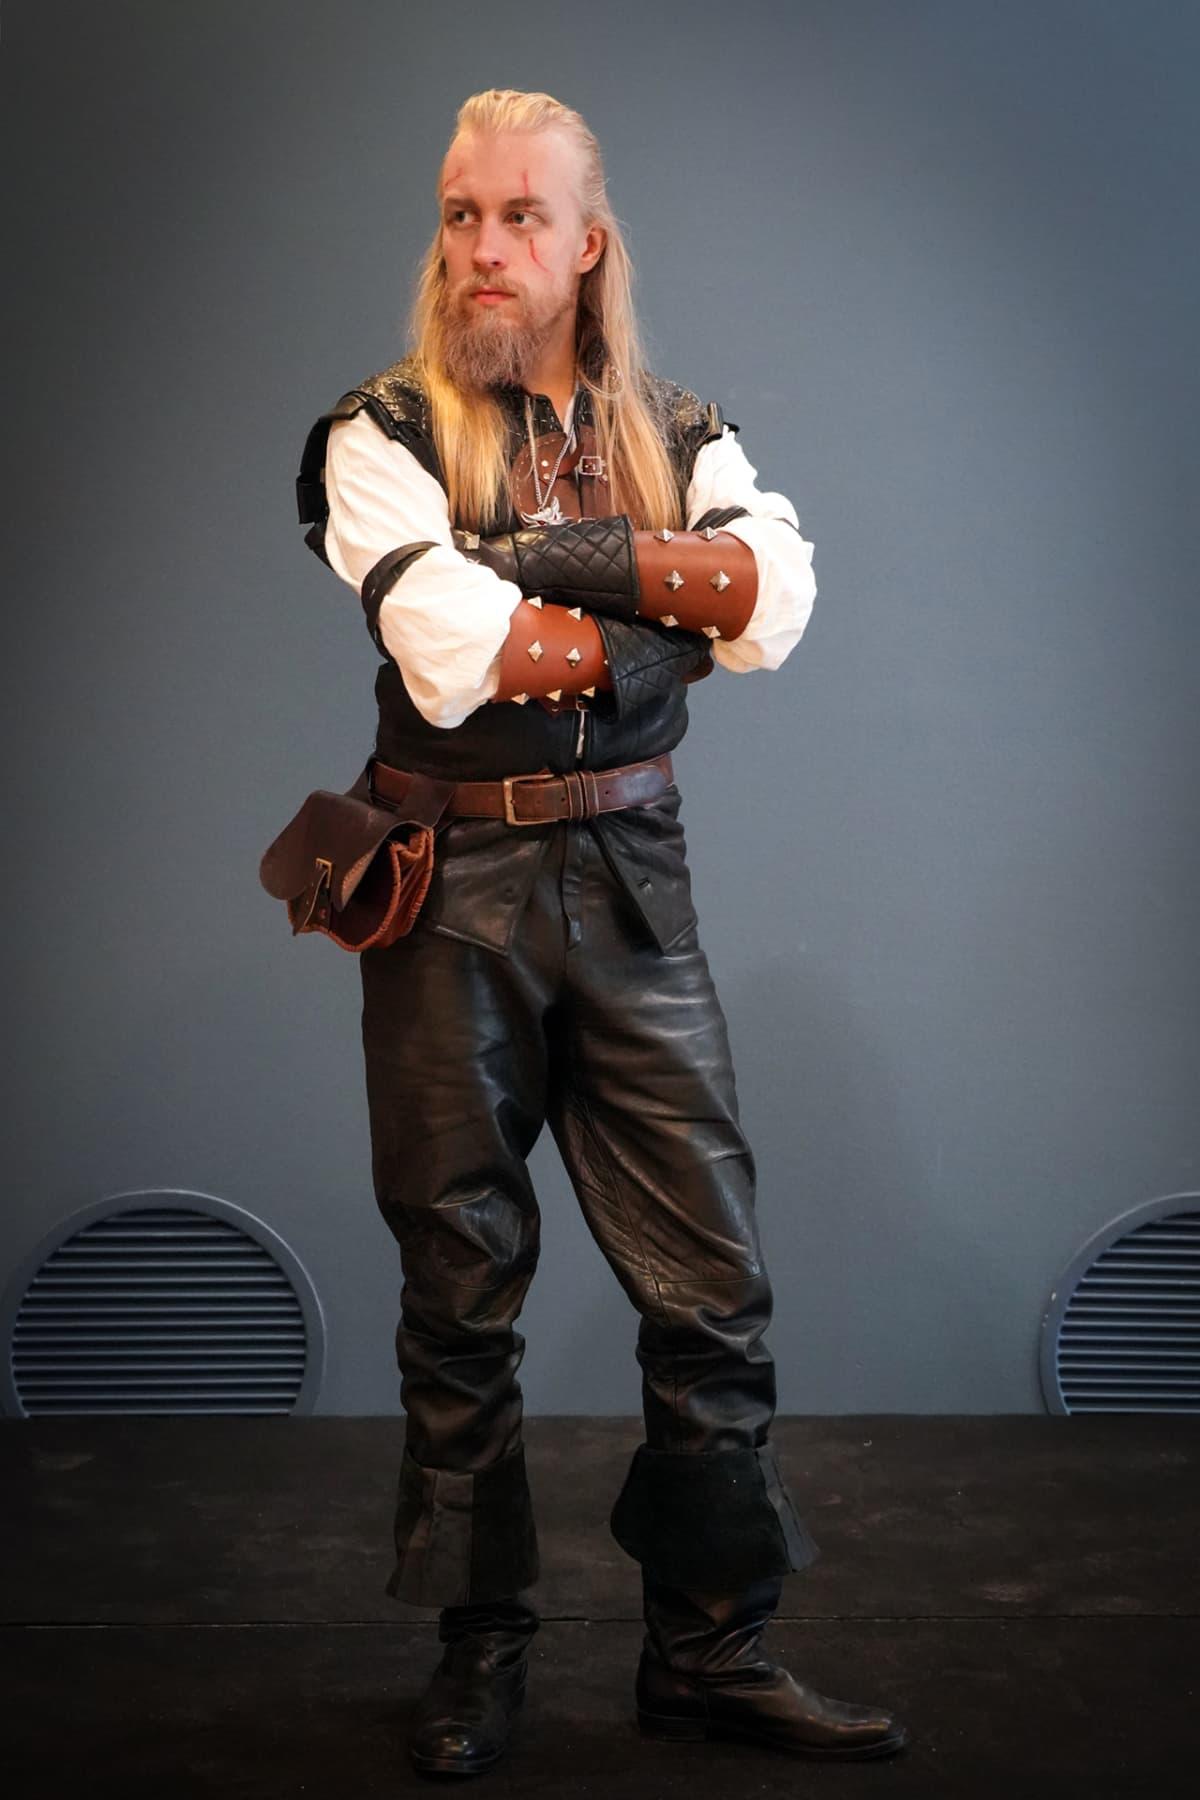 Sakari Saaristo, Popcult, cosplay, Witcher, Geralt Rivialainen